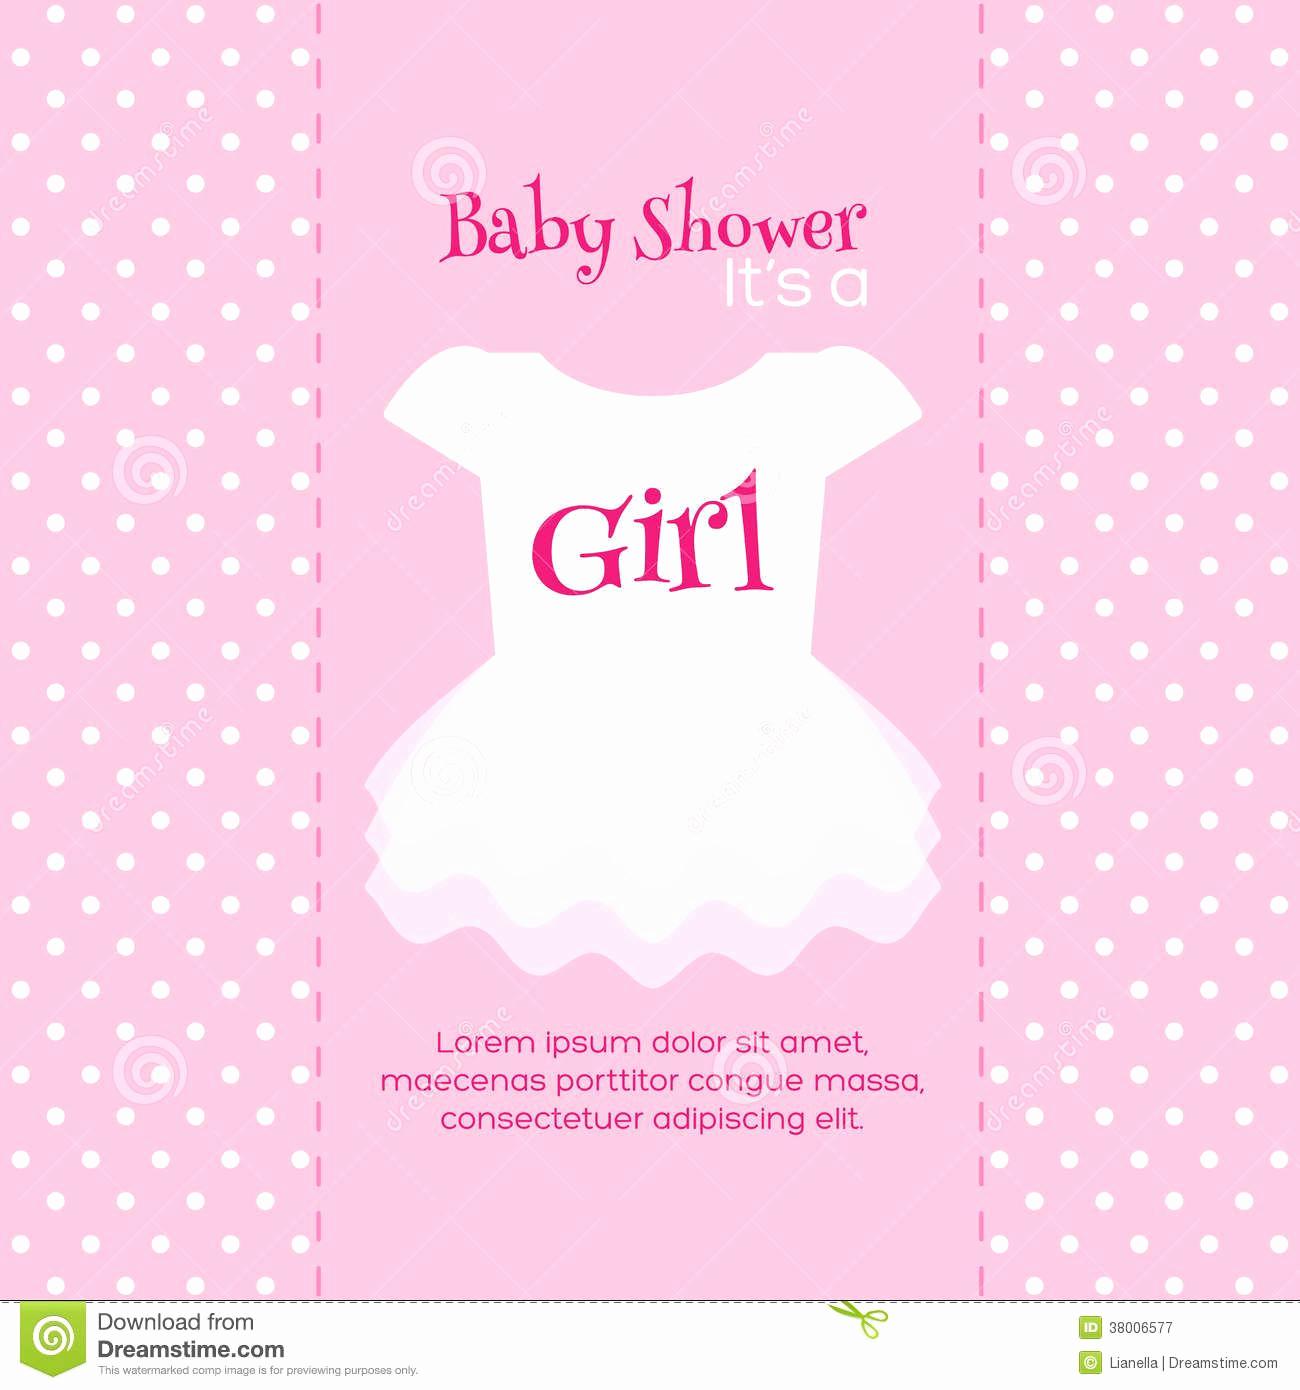 Baby Shower Invite Template Lovely Design Free Printable Baby Shower Invitations for Girls